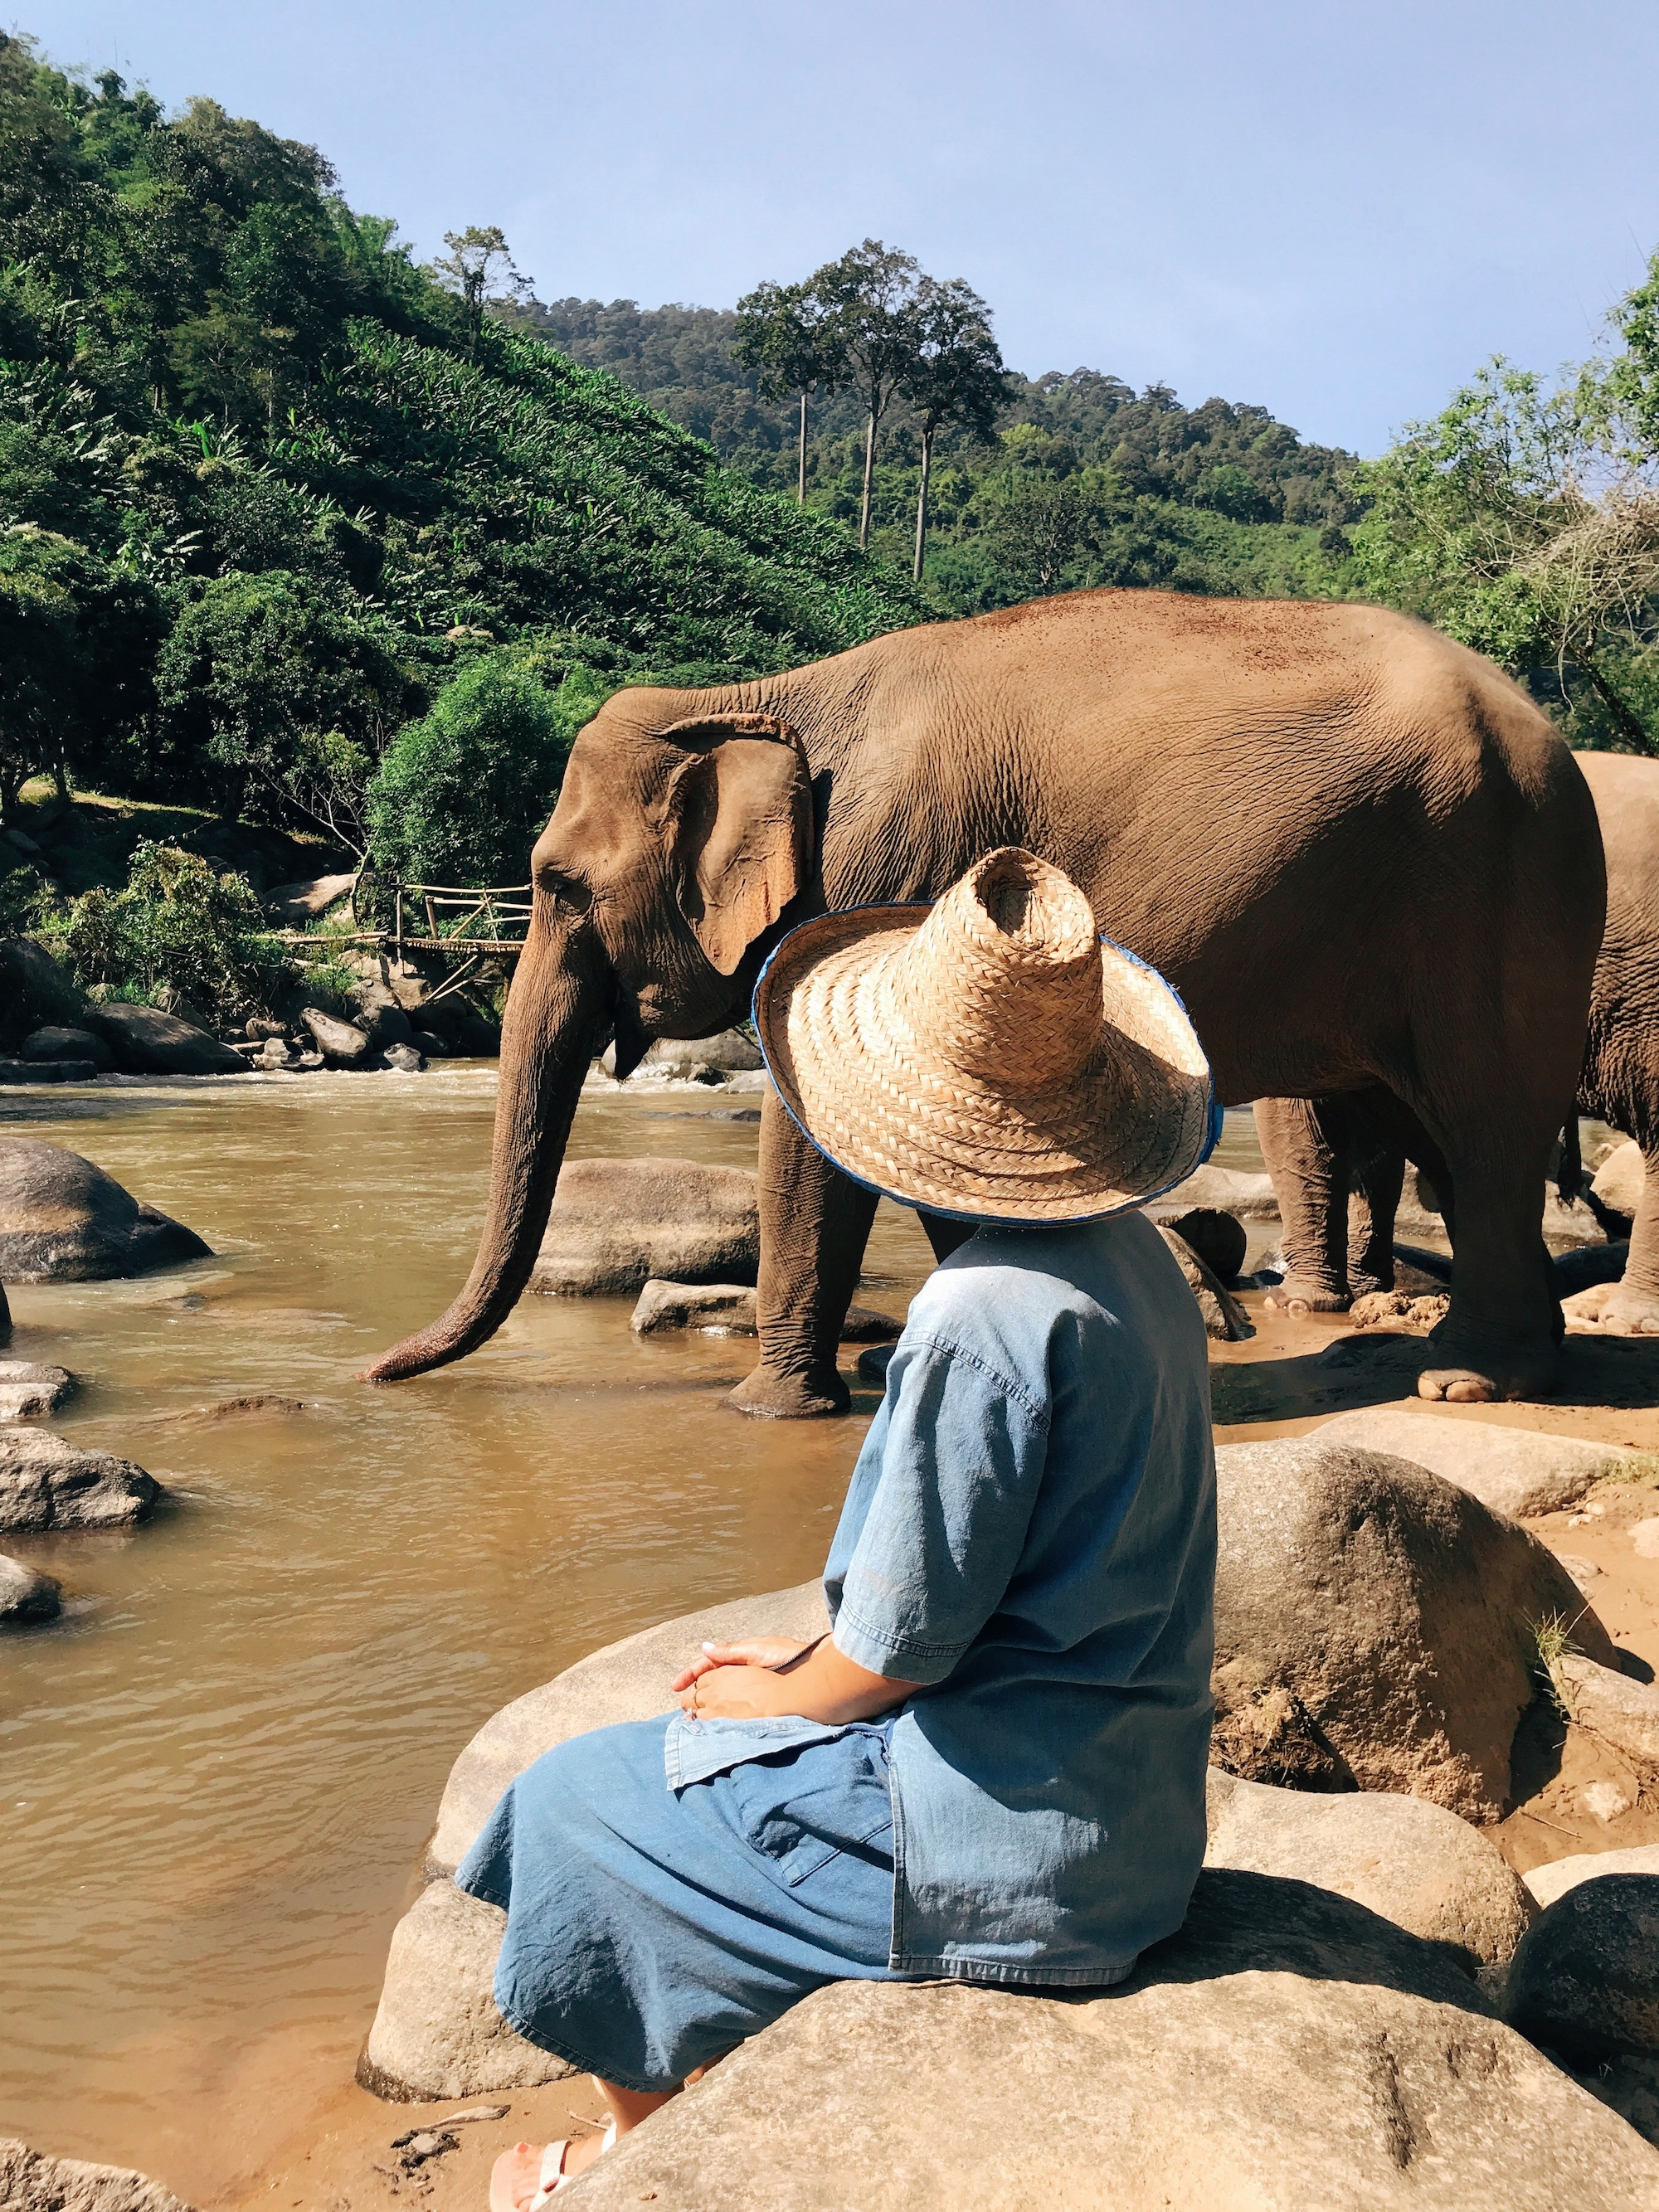 Chiang Mai Thailand Travel Guide - Claire Eliza - Elephant Nature Park 2.JPG